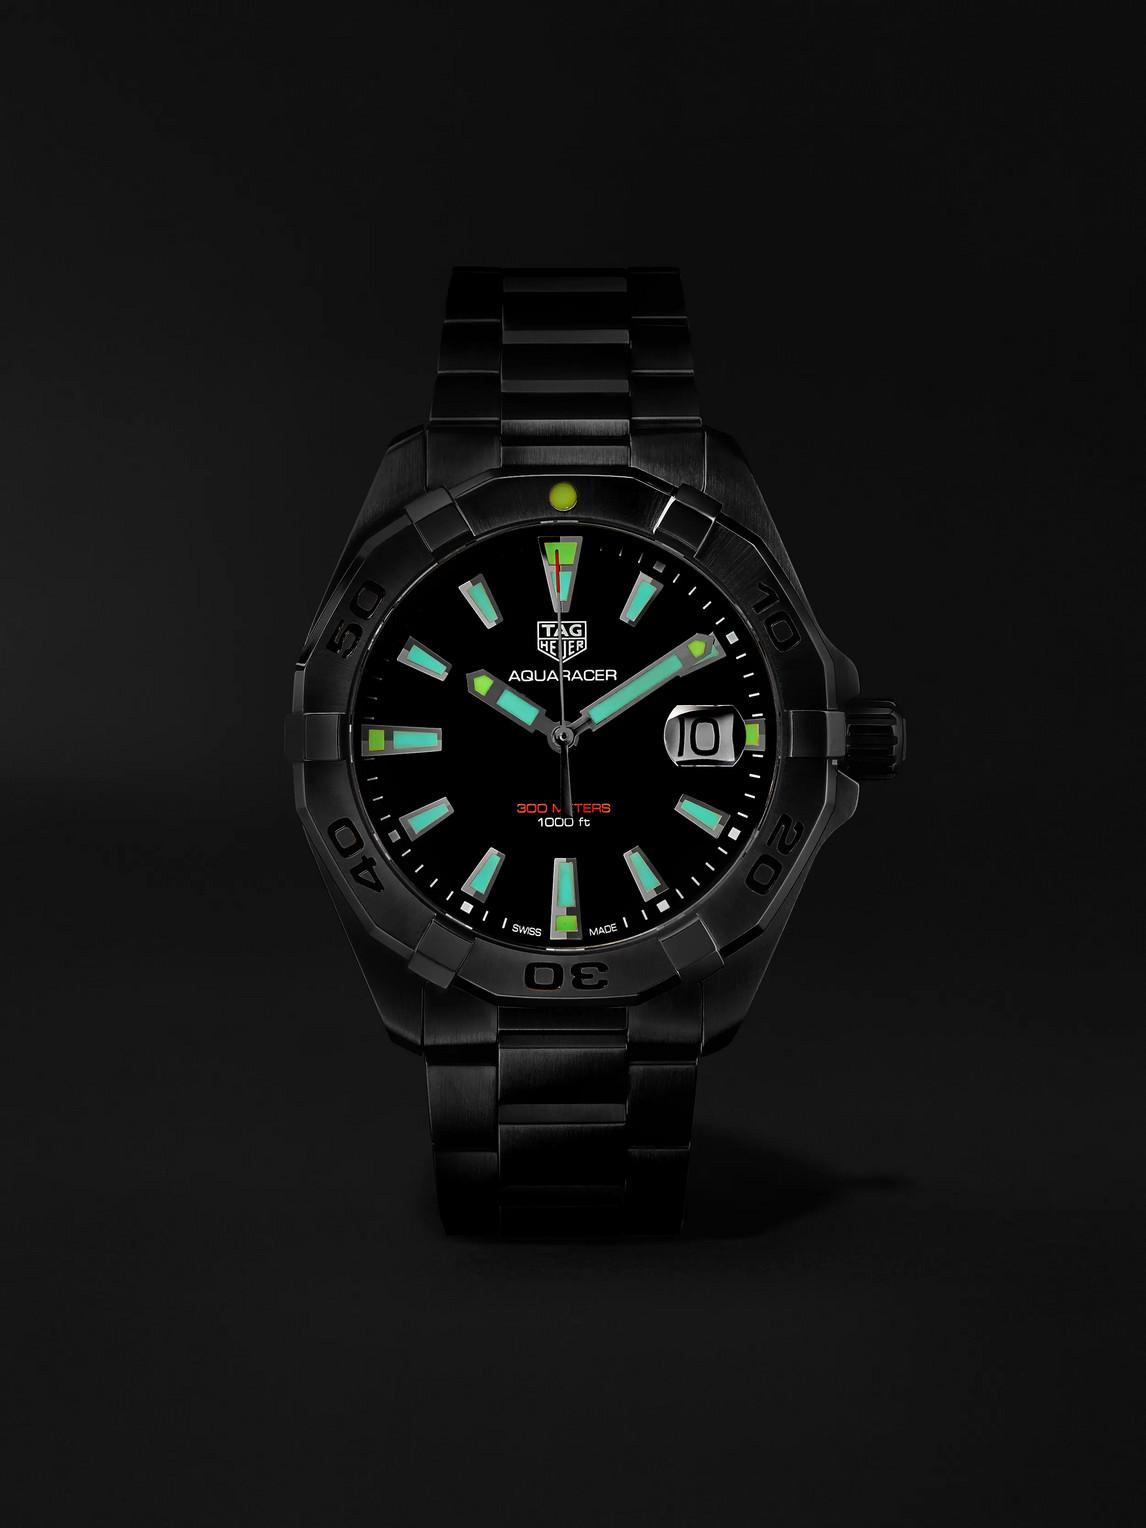 TAG HEUER Watches AQUARACER QUARTZ 41MM STEEL WATCH, REF. NO. WBD1112.BA0928